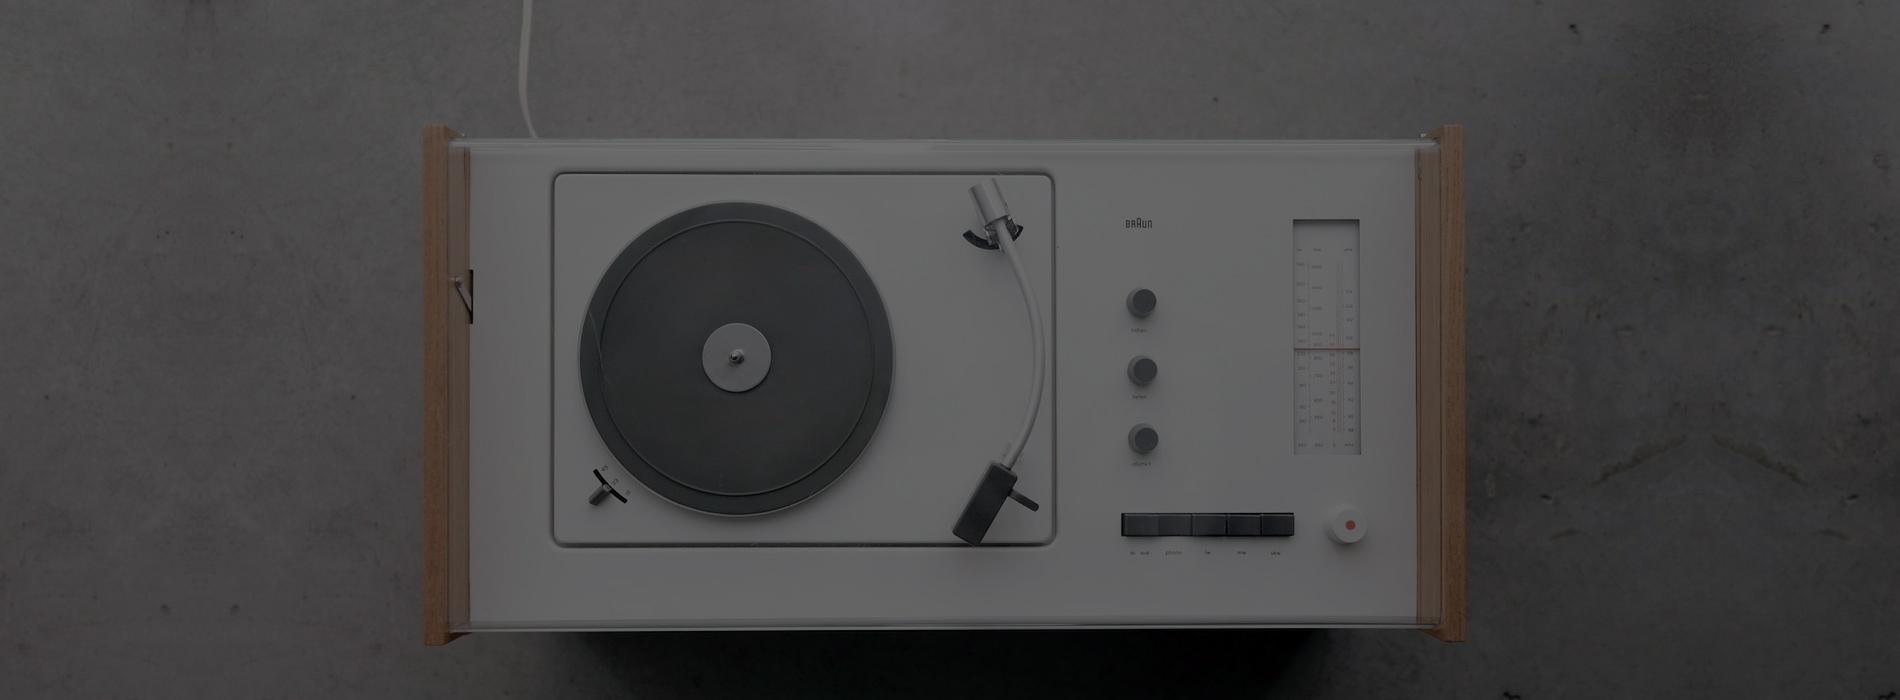 Dieter Rams:  10 Principles for  Good Design